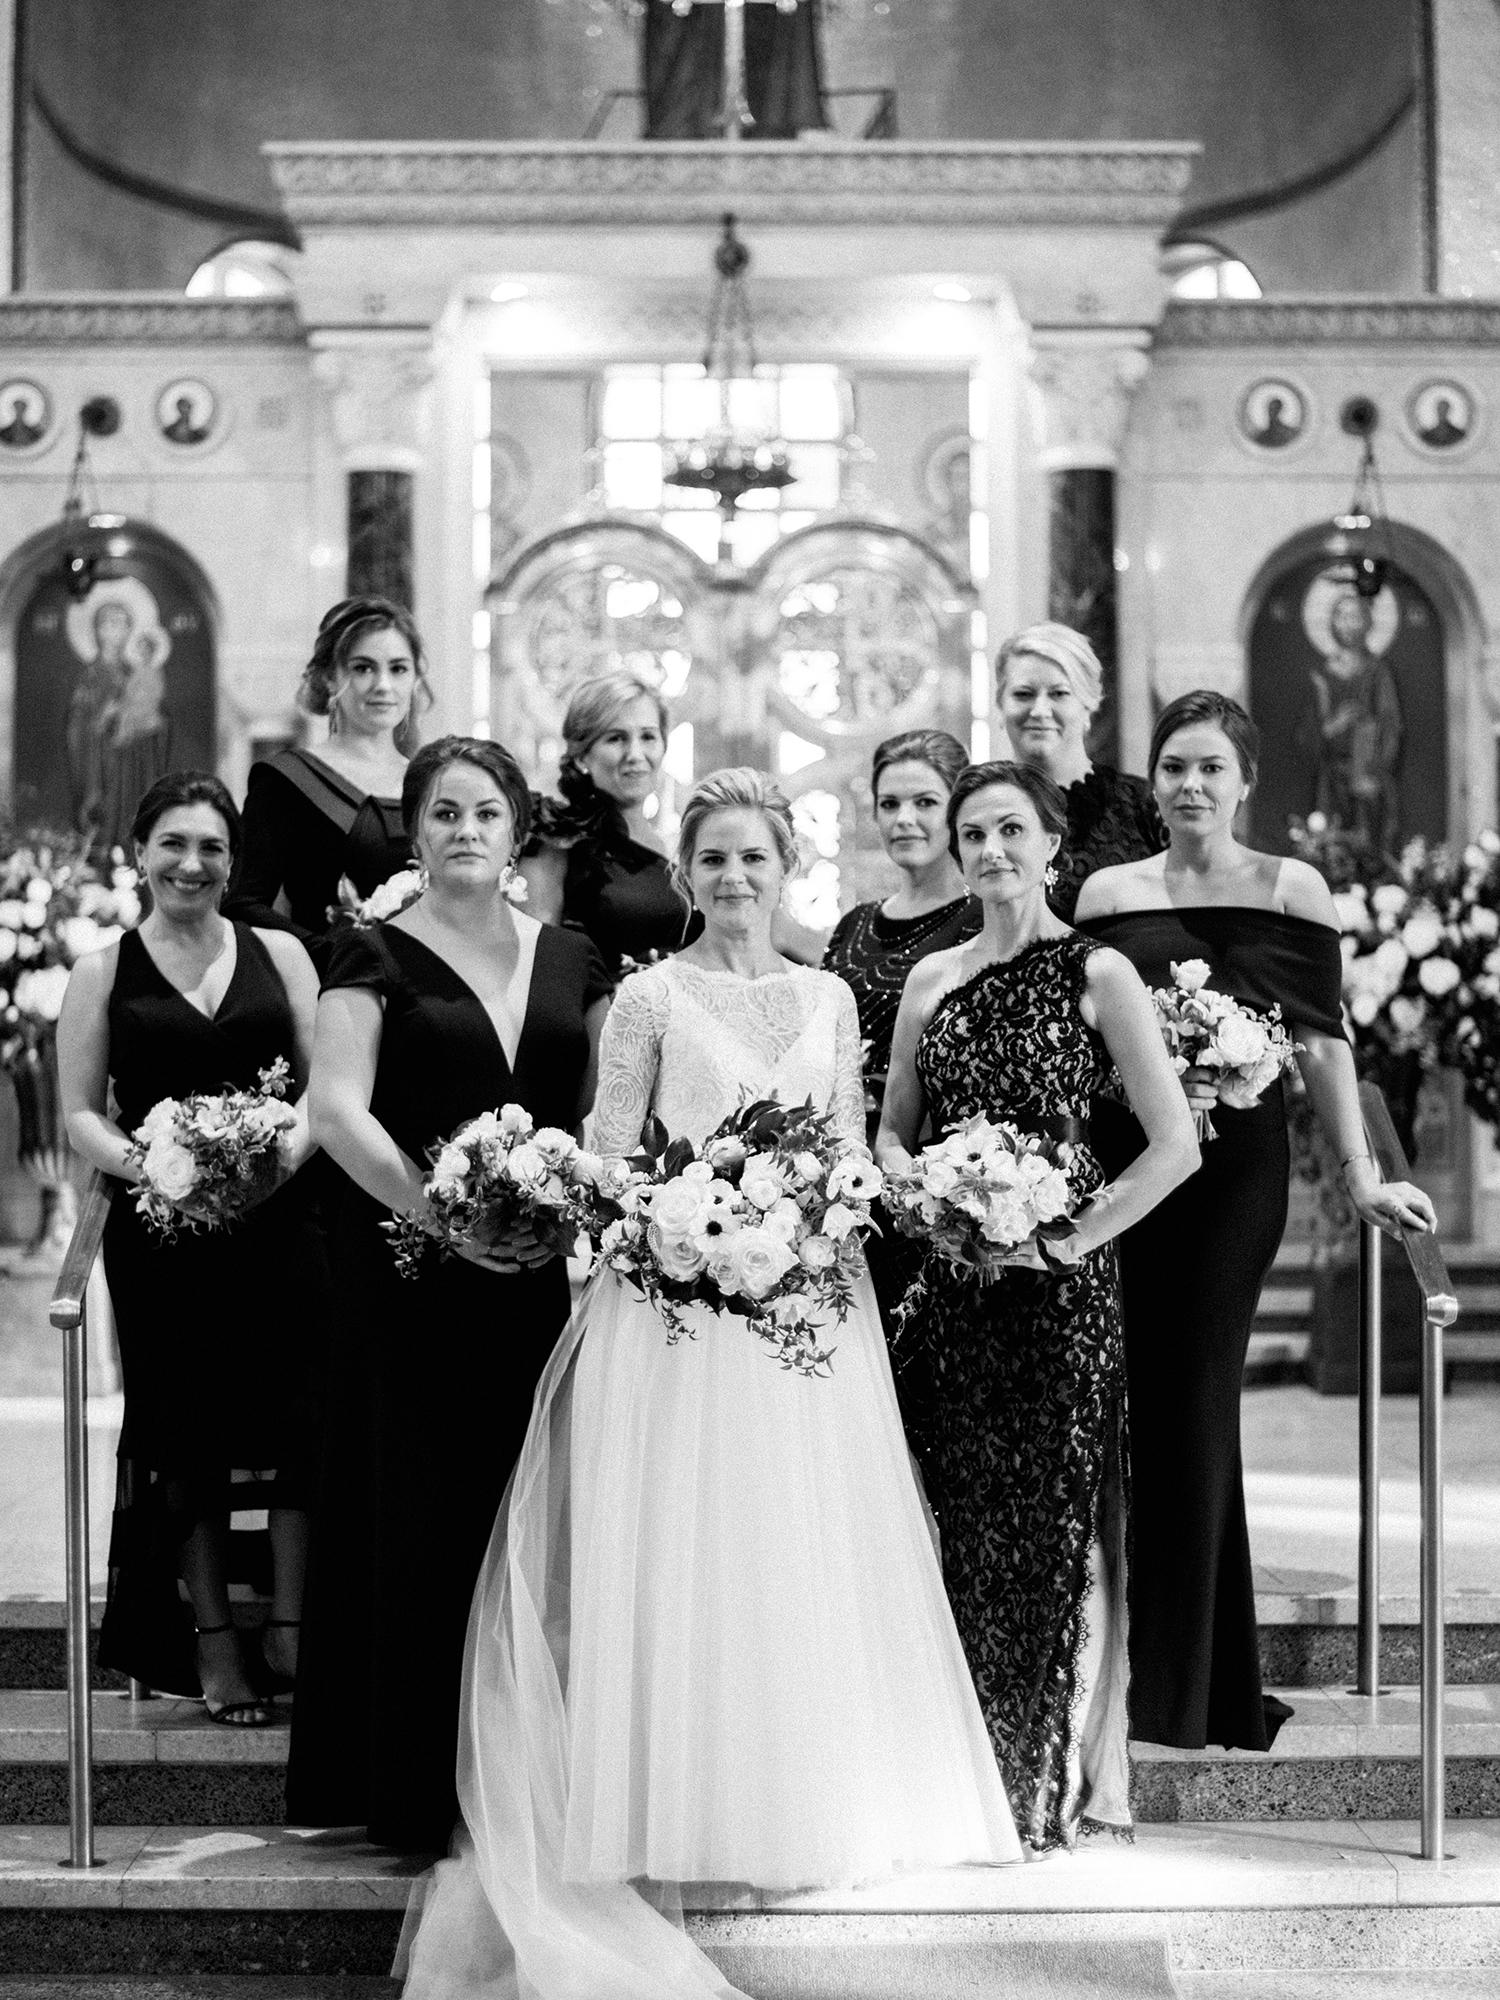 Wedding ceremony in Washington DC